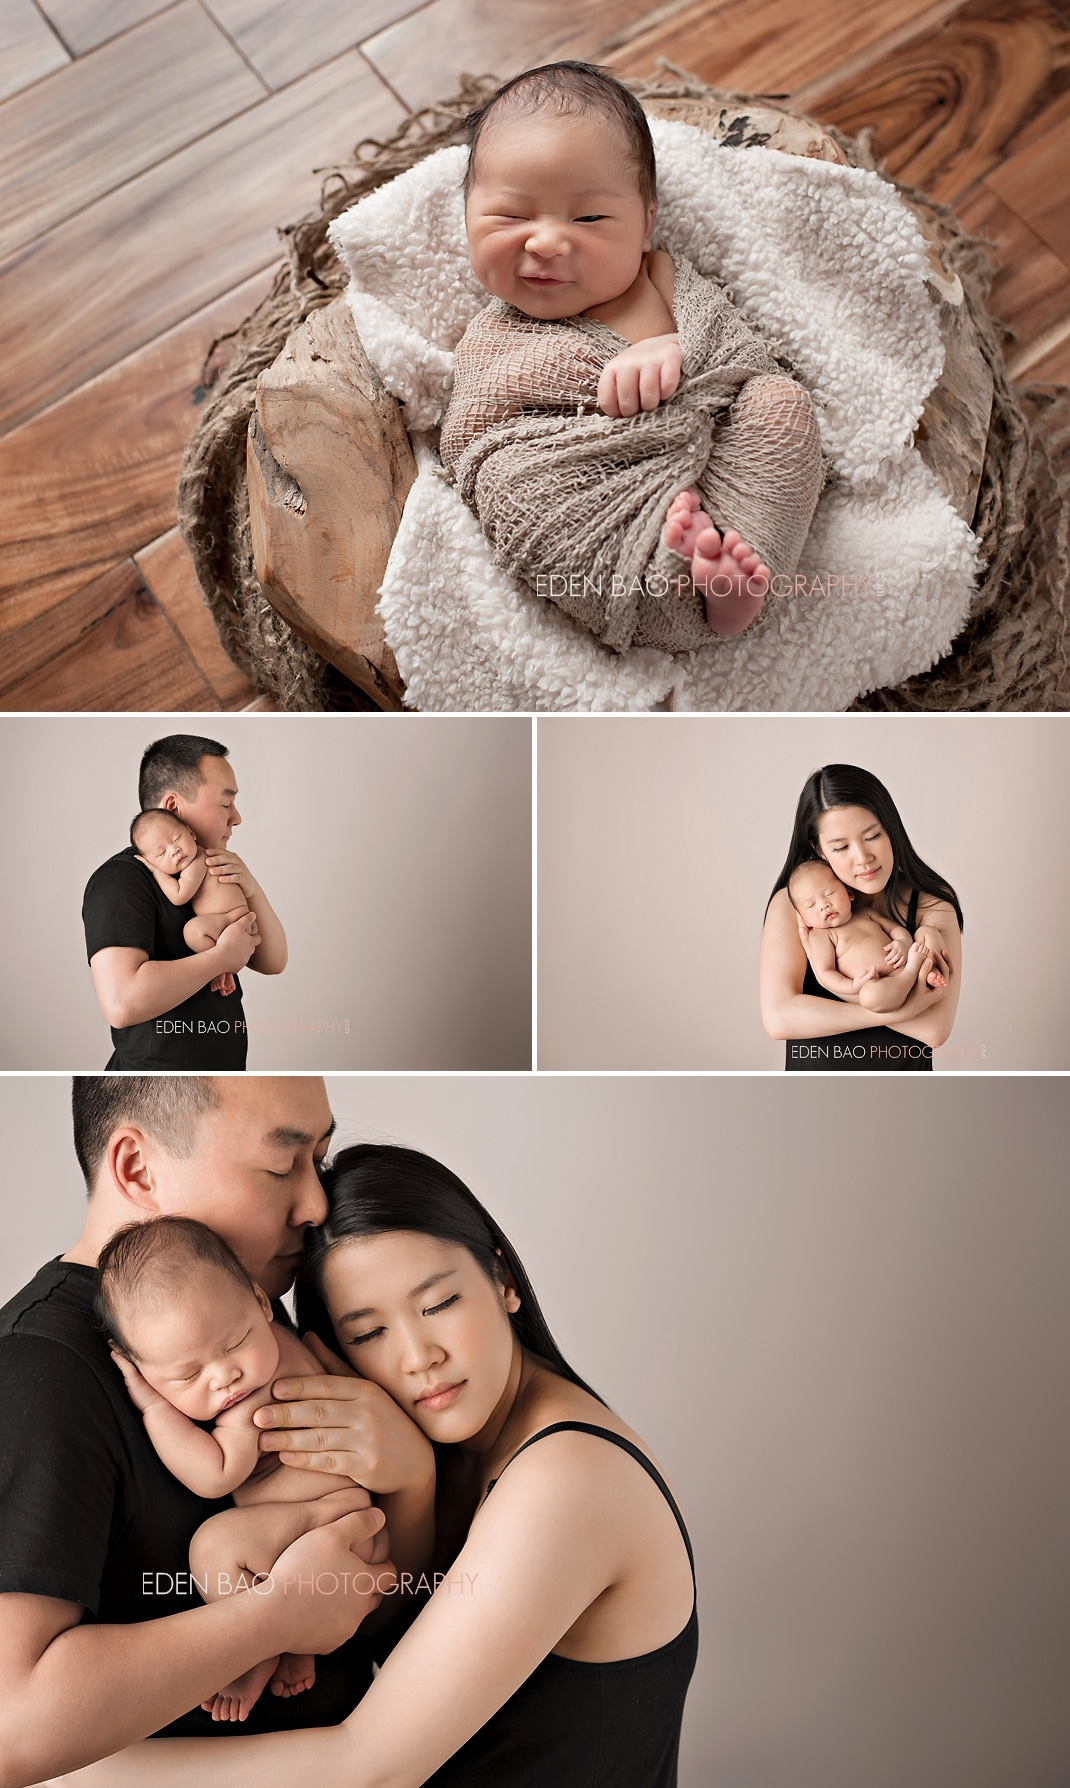 Vancouver BC Newborn Photographer Eden Bao | Newborn boy acacia hardwood floor parent-baby  family